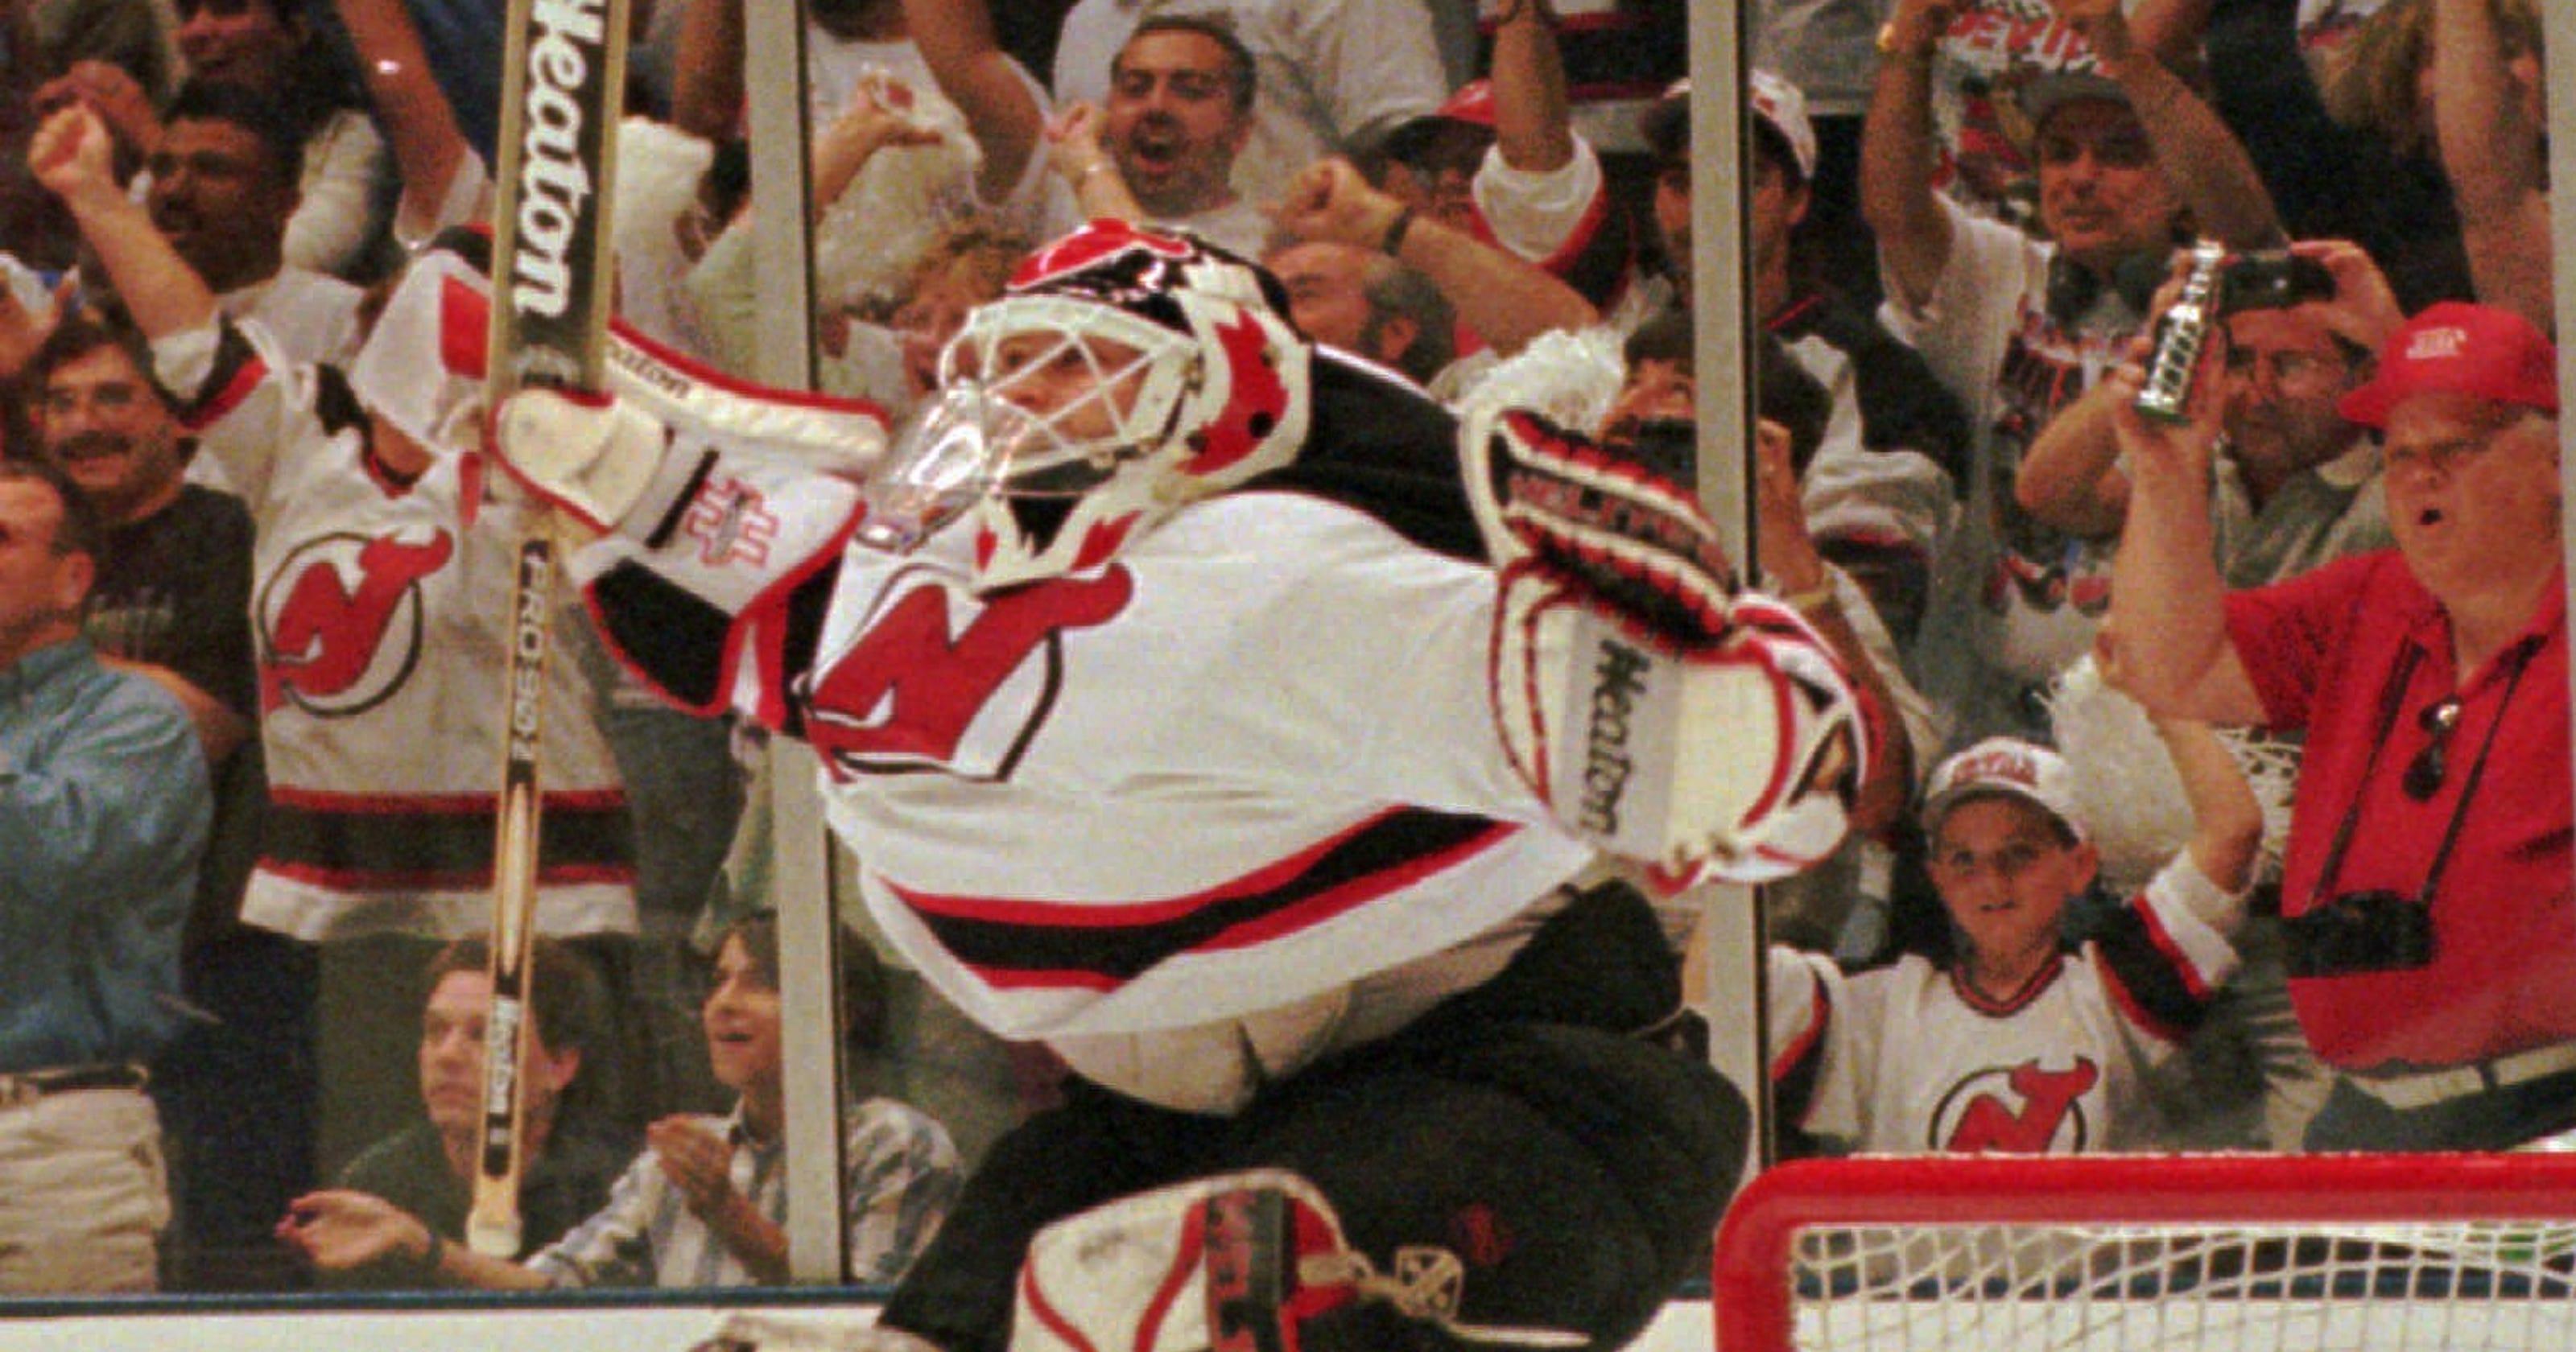 a8f76ec1d Martin Brodeur as NJ Devils saw him  Leadership